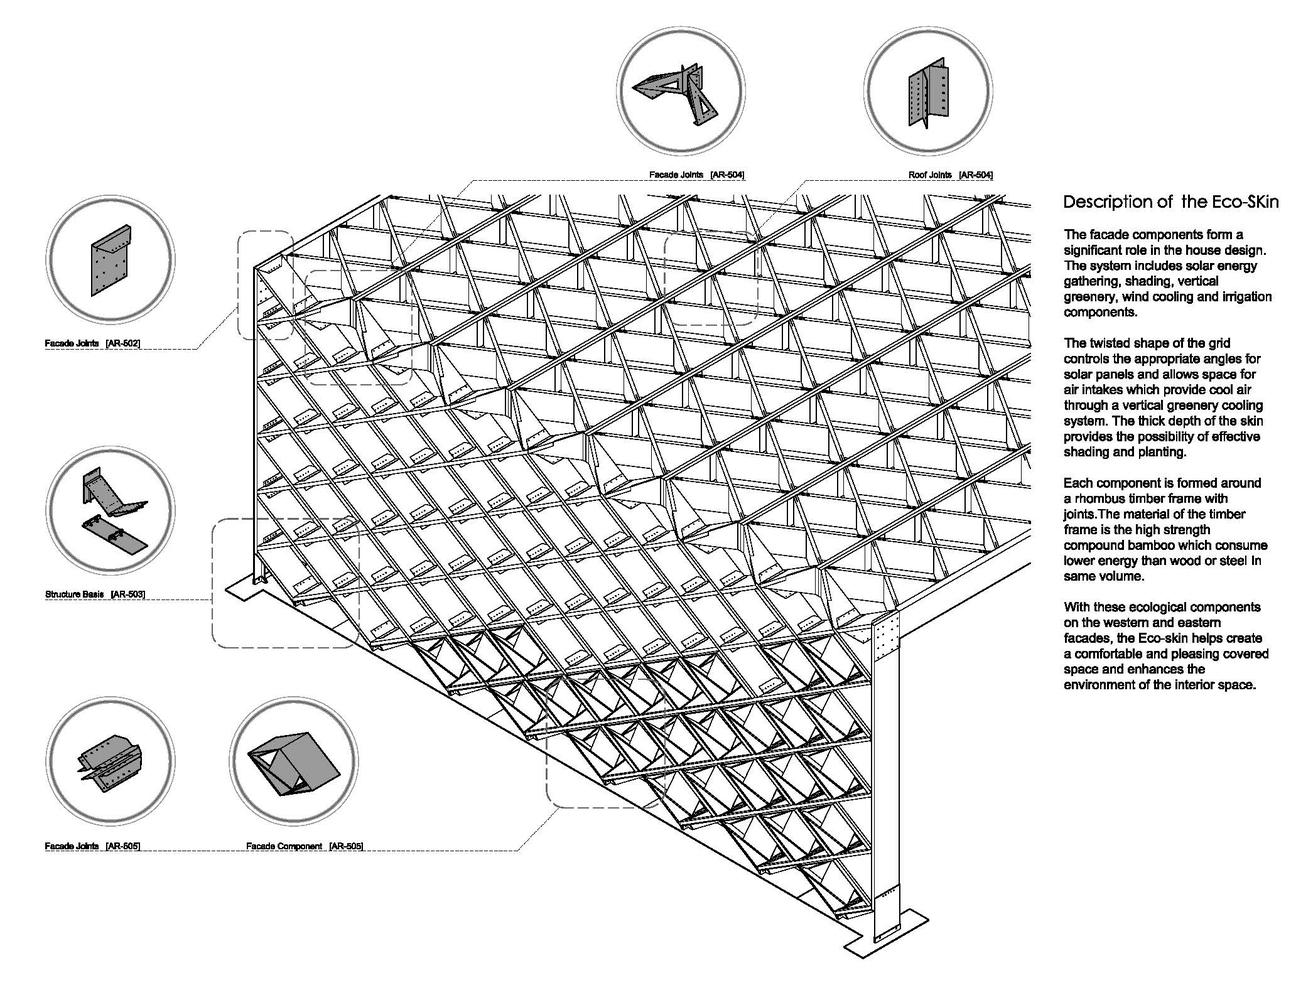 para eco house tongji university team skin elements diagram [ 1291 x 1000 Pixel ]